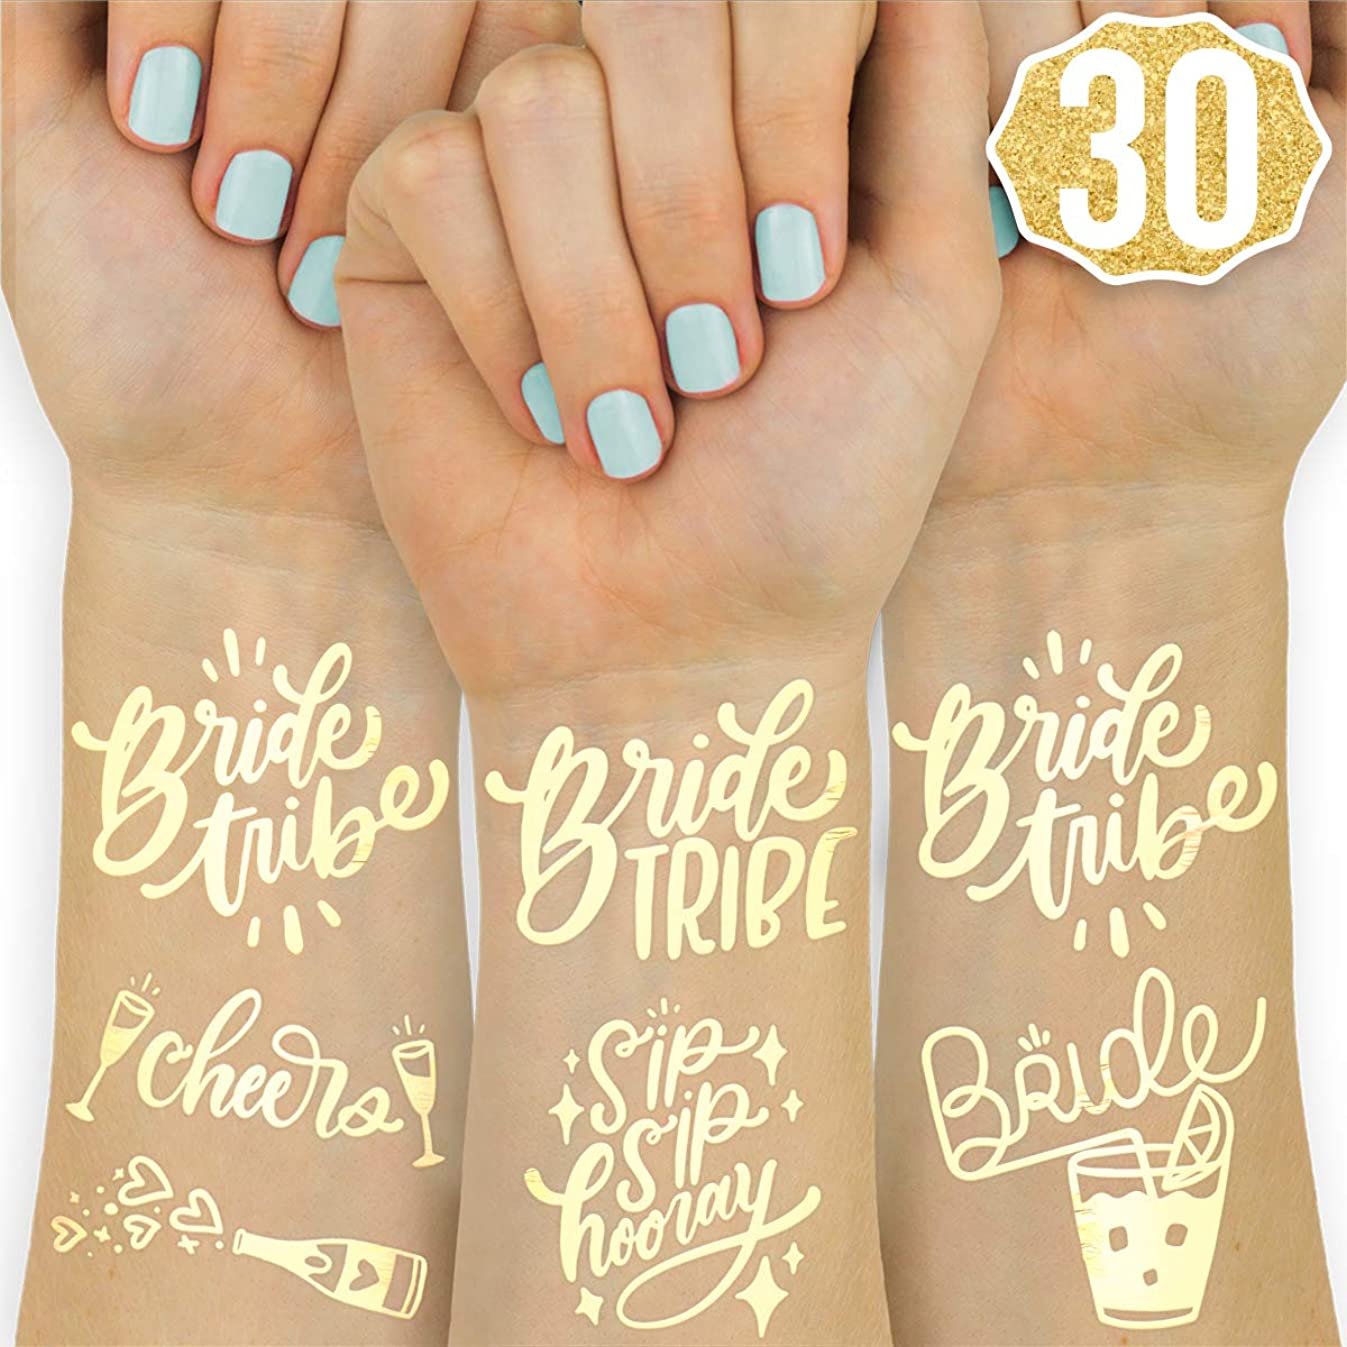 xo, Fetti 30 Bride Tribe Flash Tattoos | Bachelorette Party Decorations, Bridesmaid Favor + Bride to Be